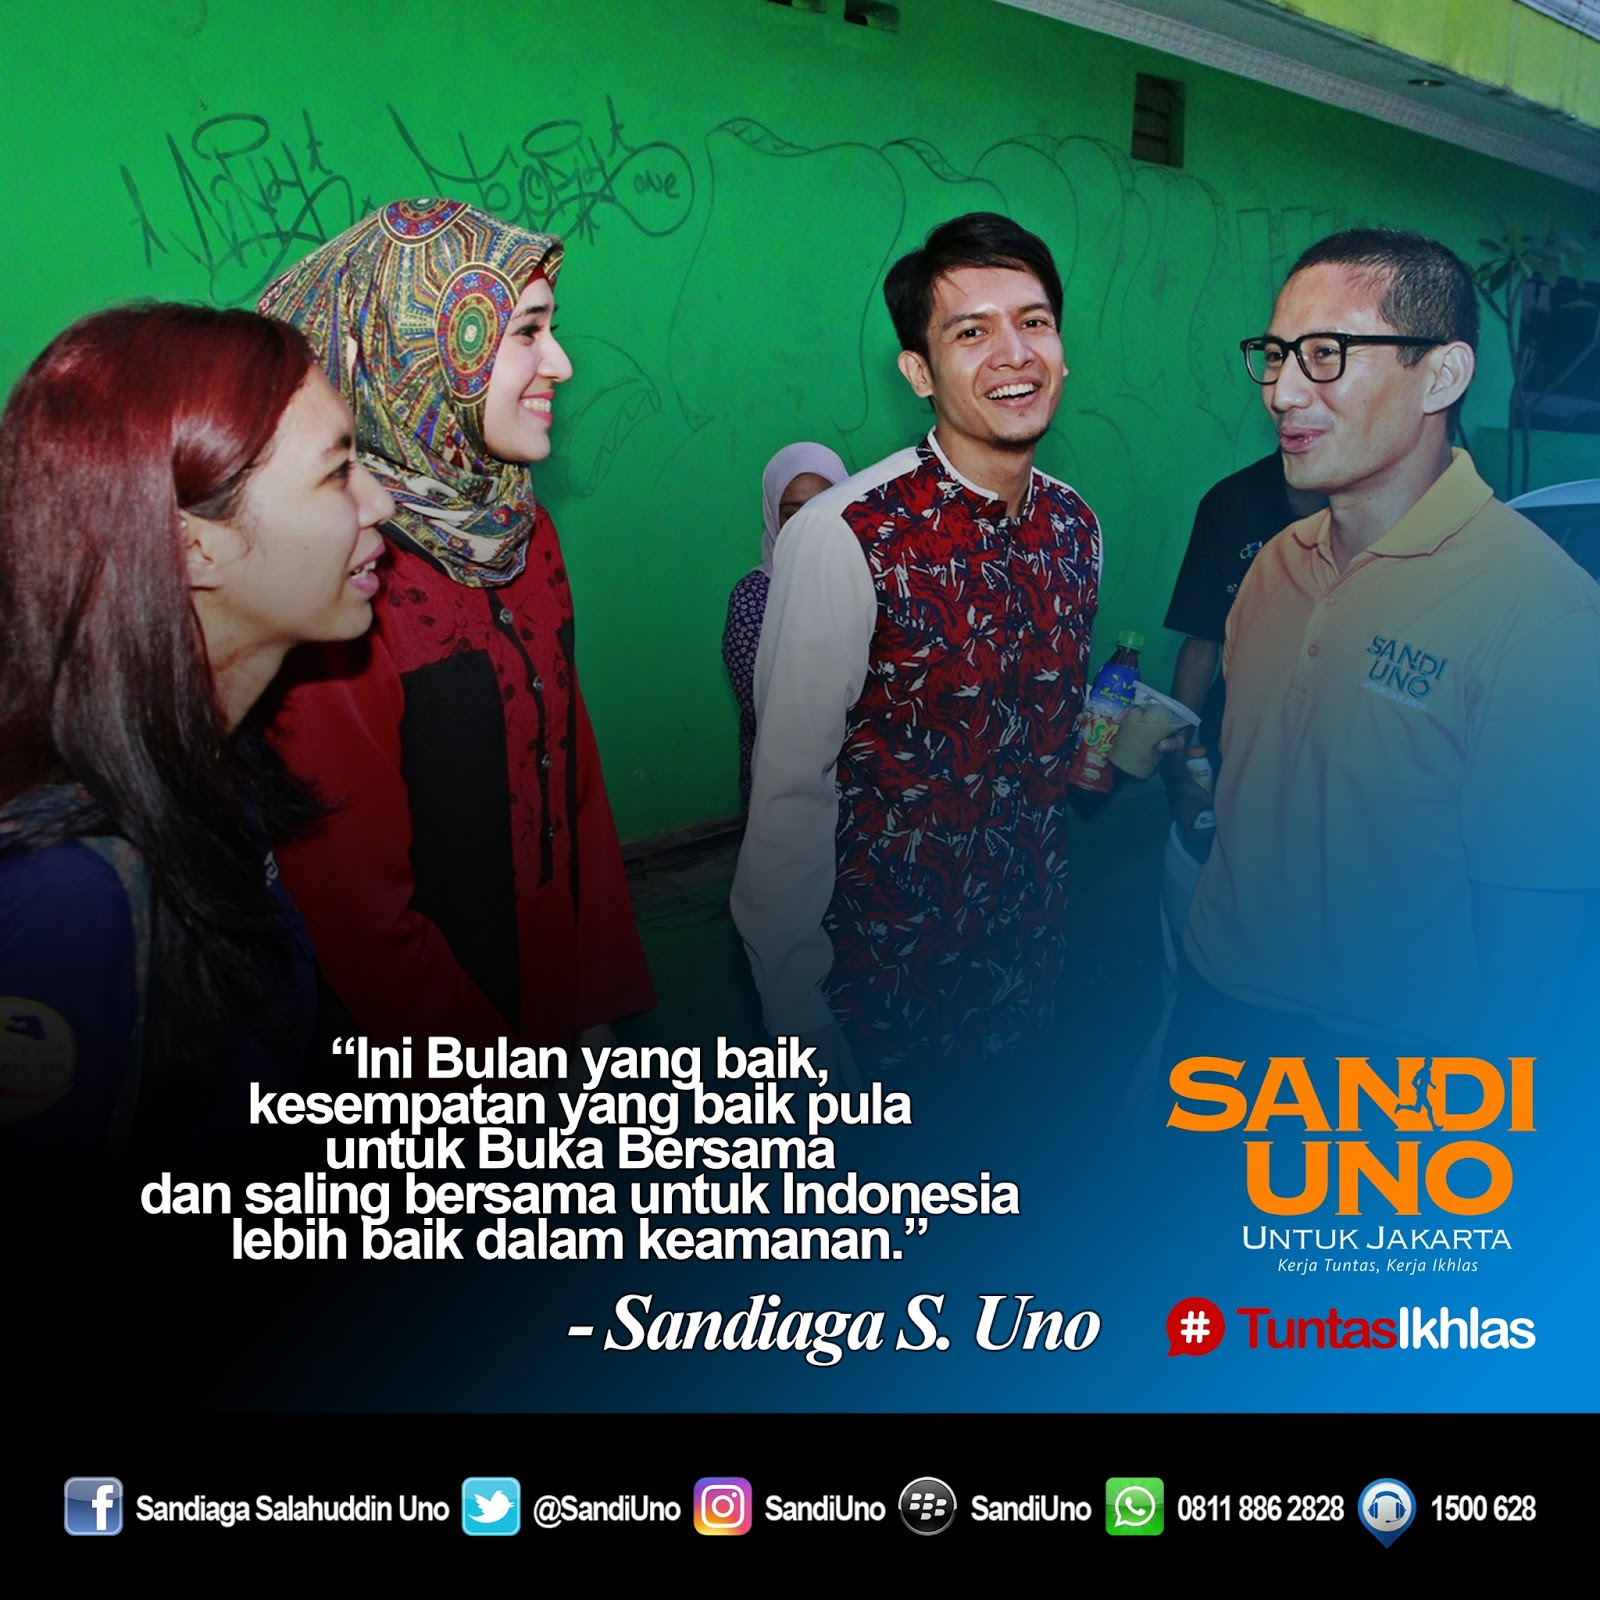 Sandi Uno DKI Jakarta Juni 2016